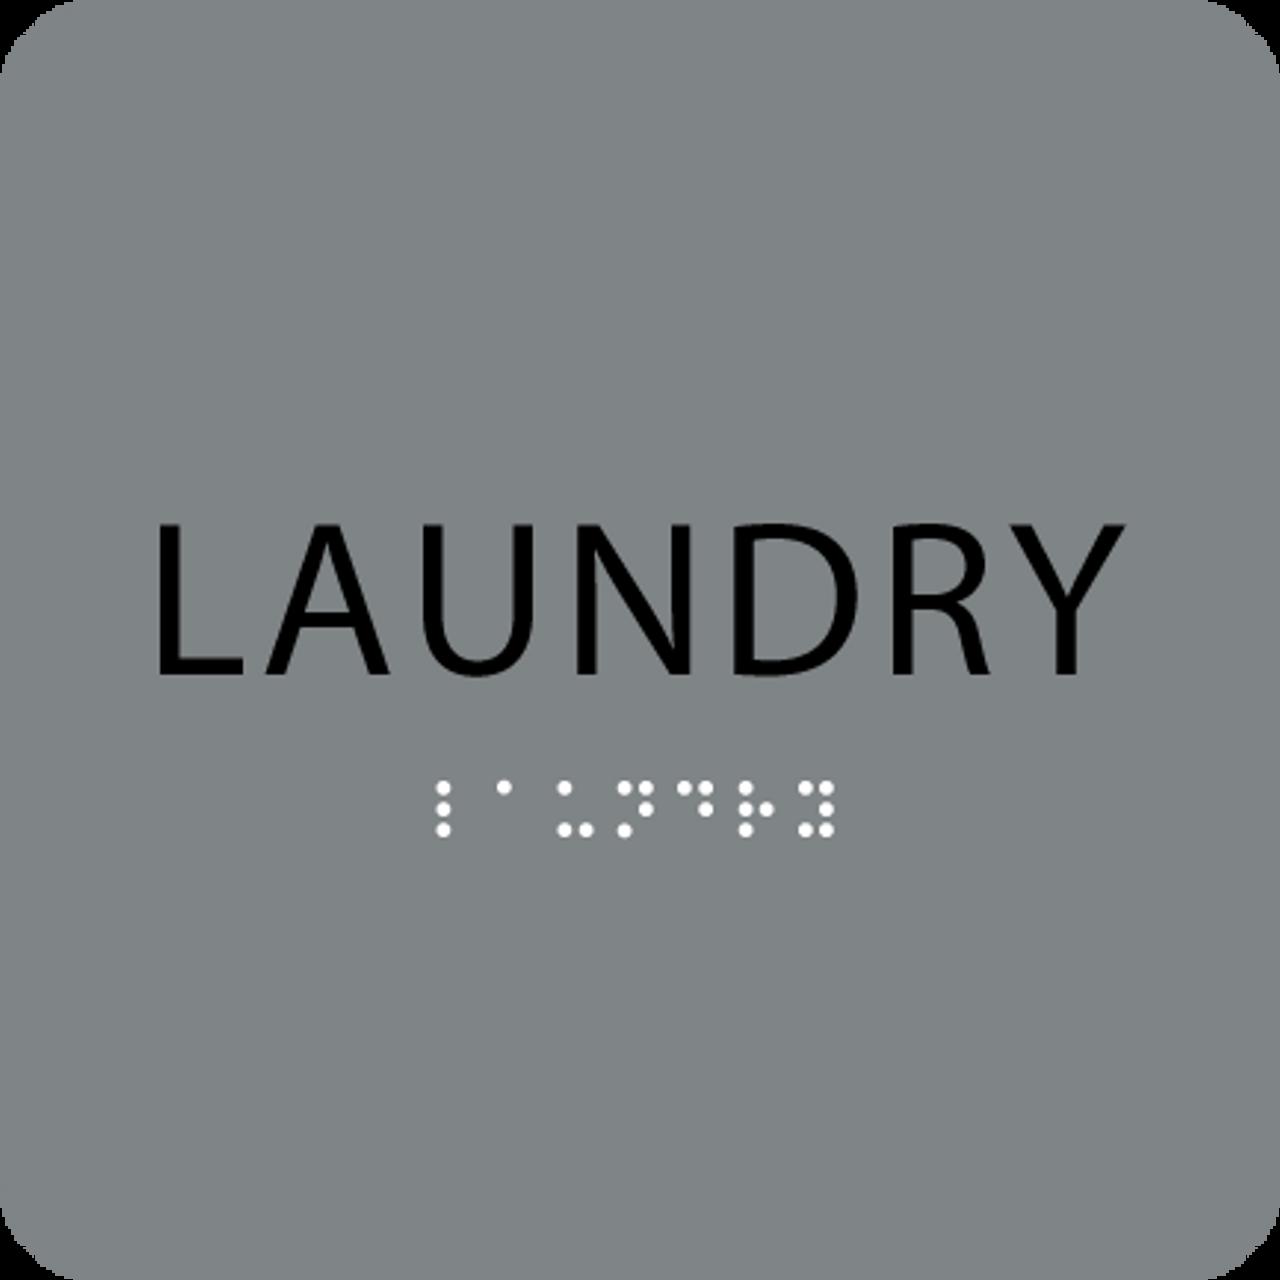 Grey Laundry ADA Sign